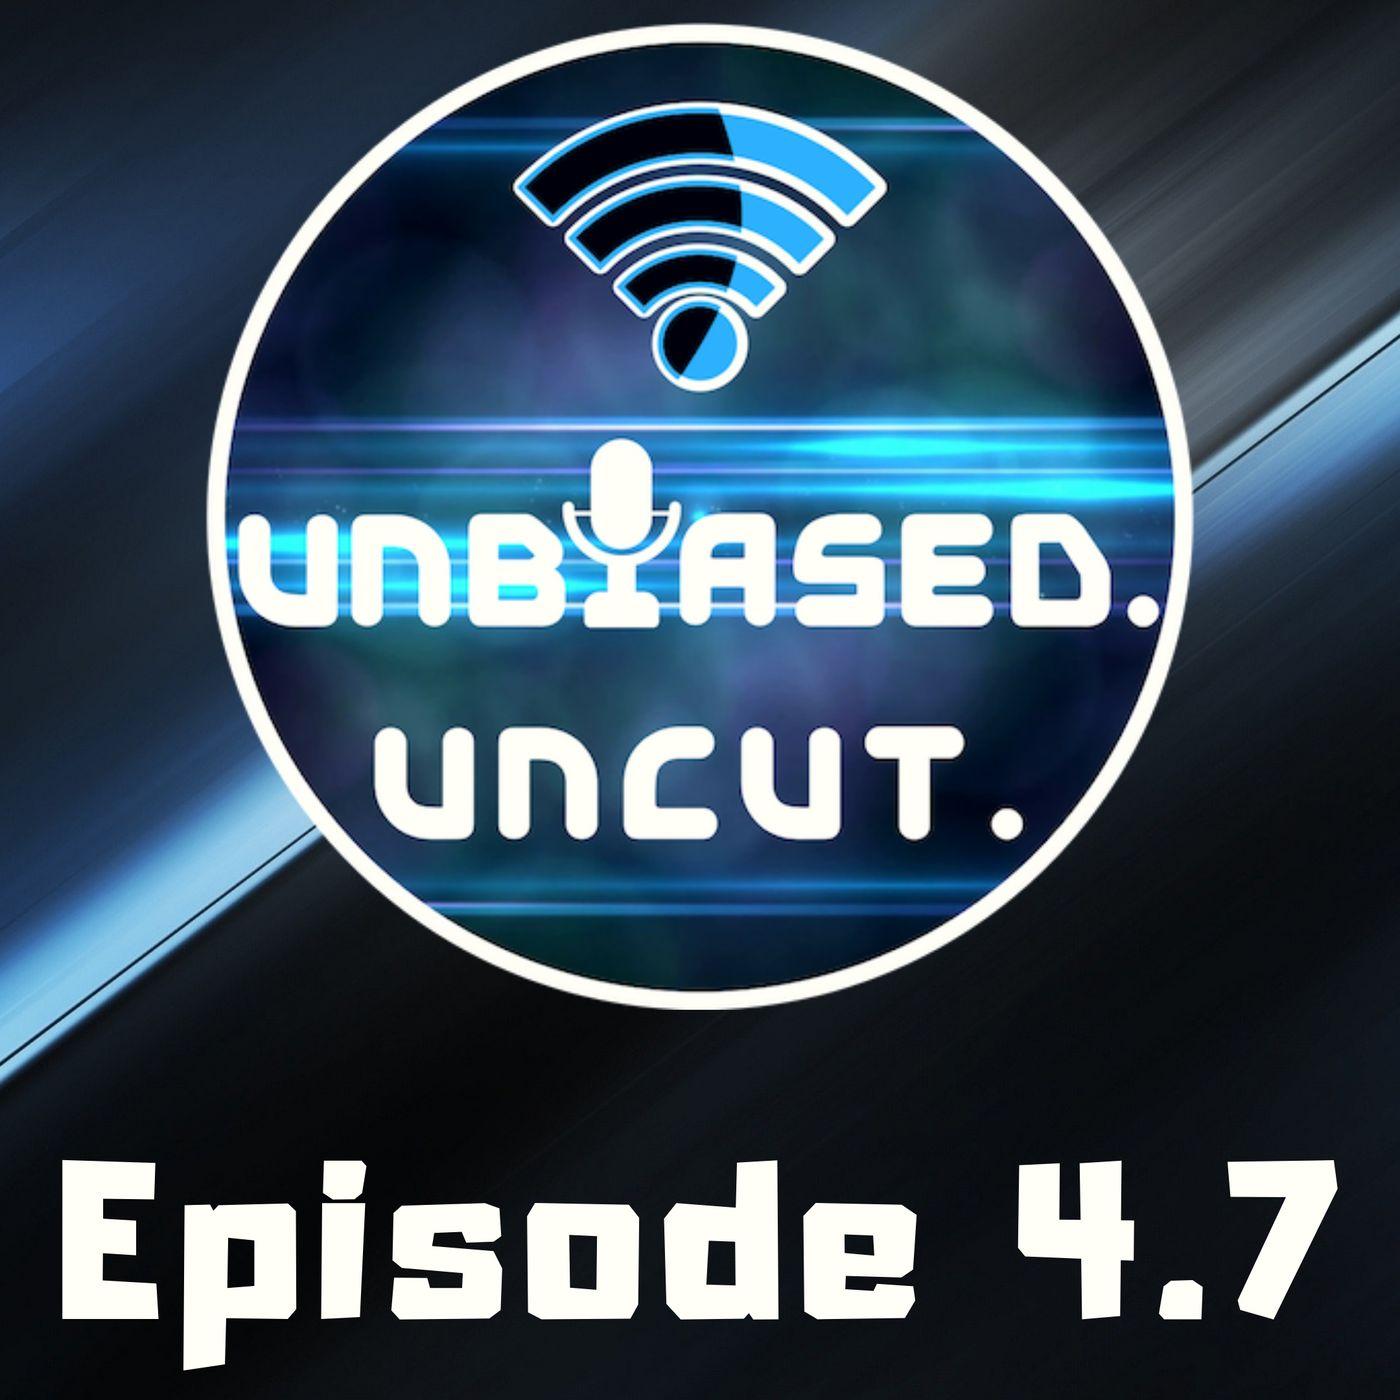 Episode 4.7: 40th Episode (Season Finale)